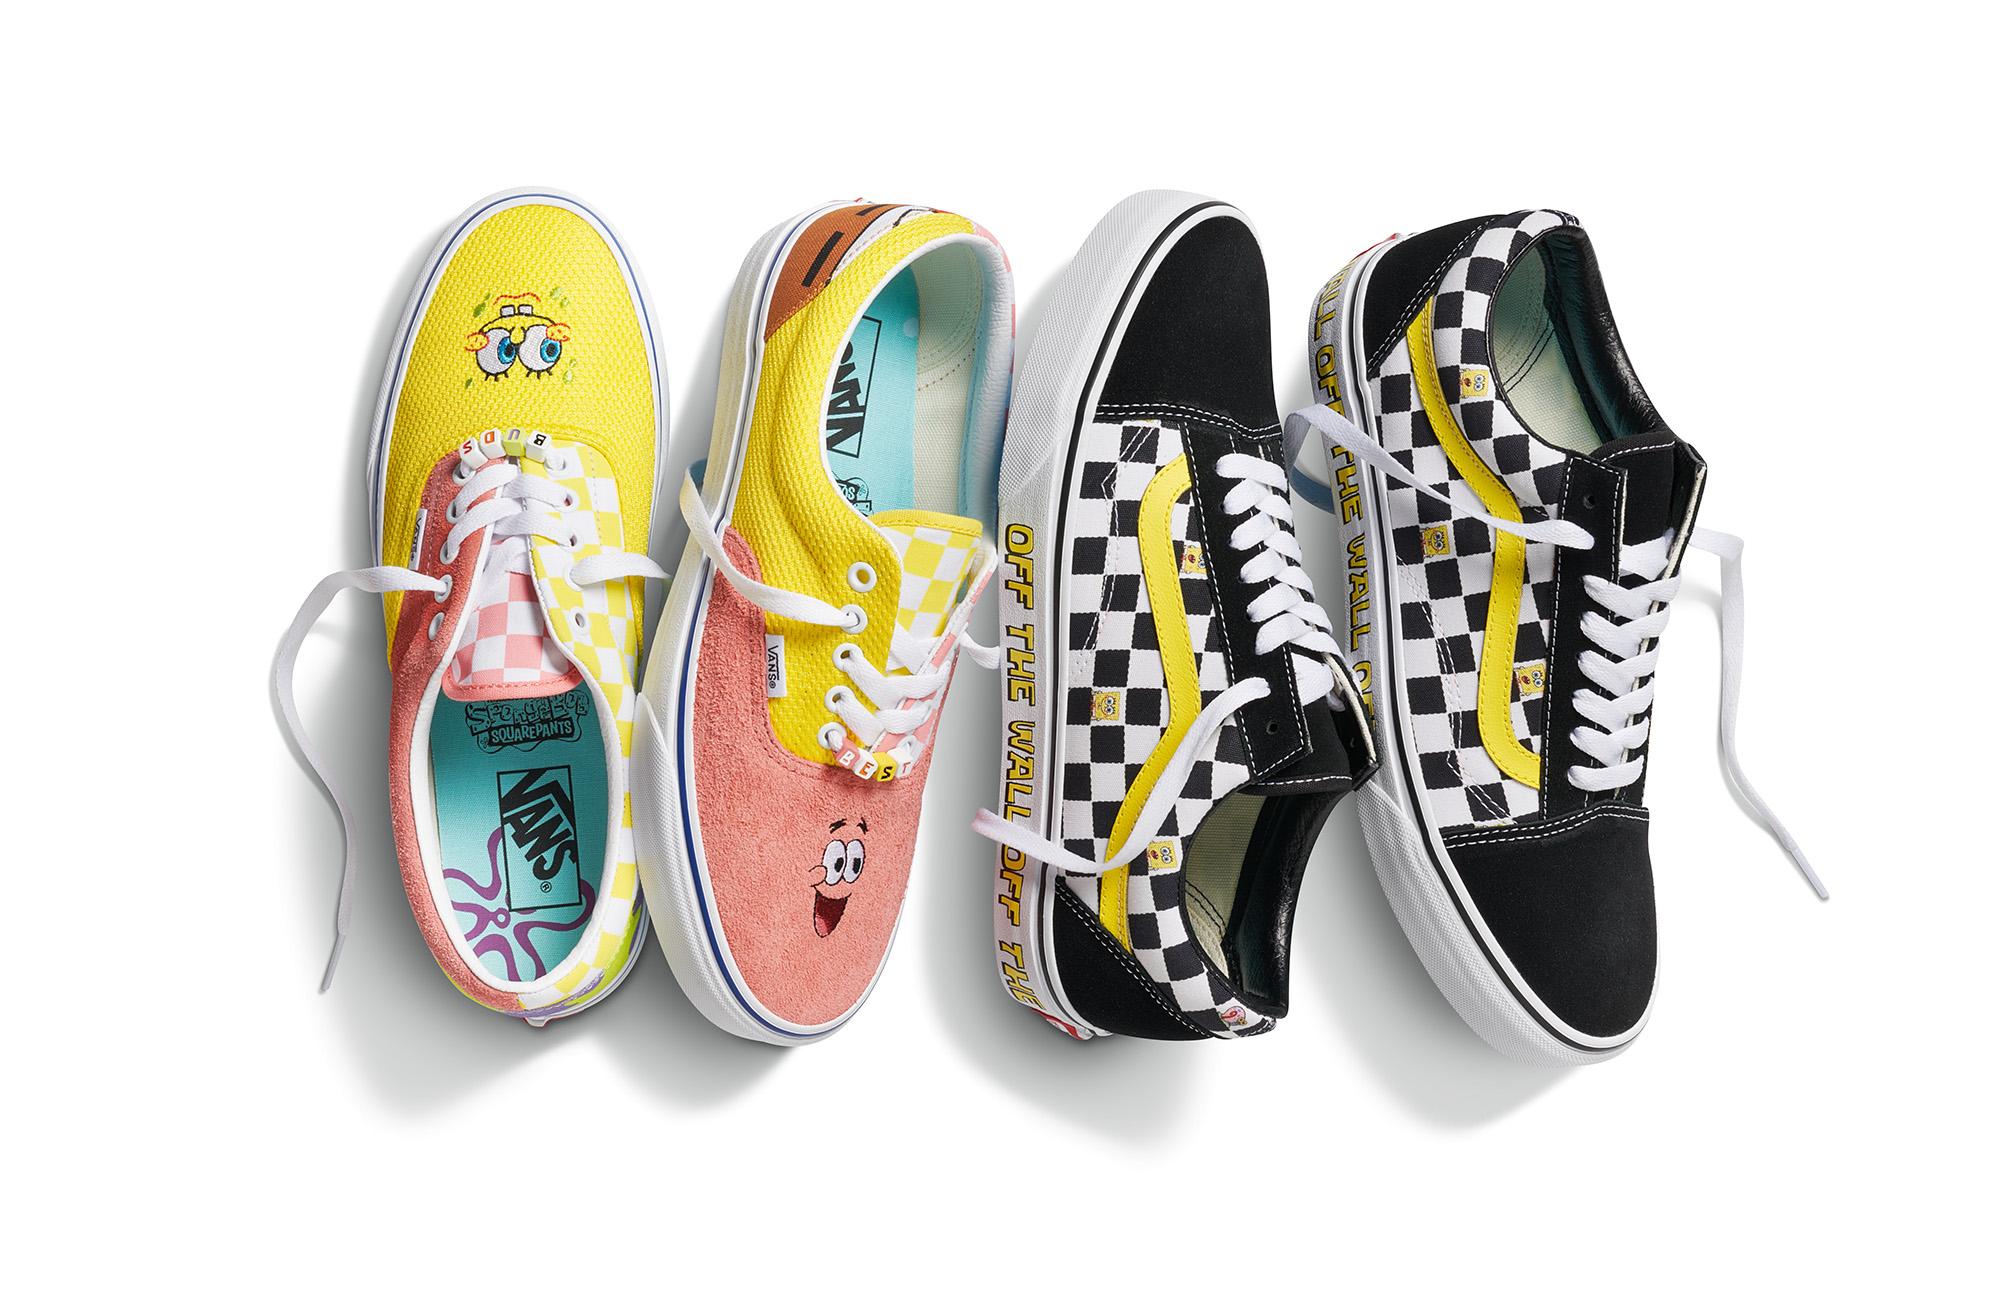 Vans x SpongeBob SquarePants: in arrivo due capsule collection